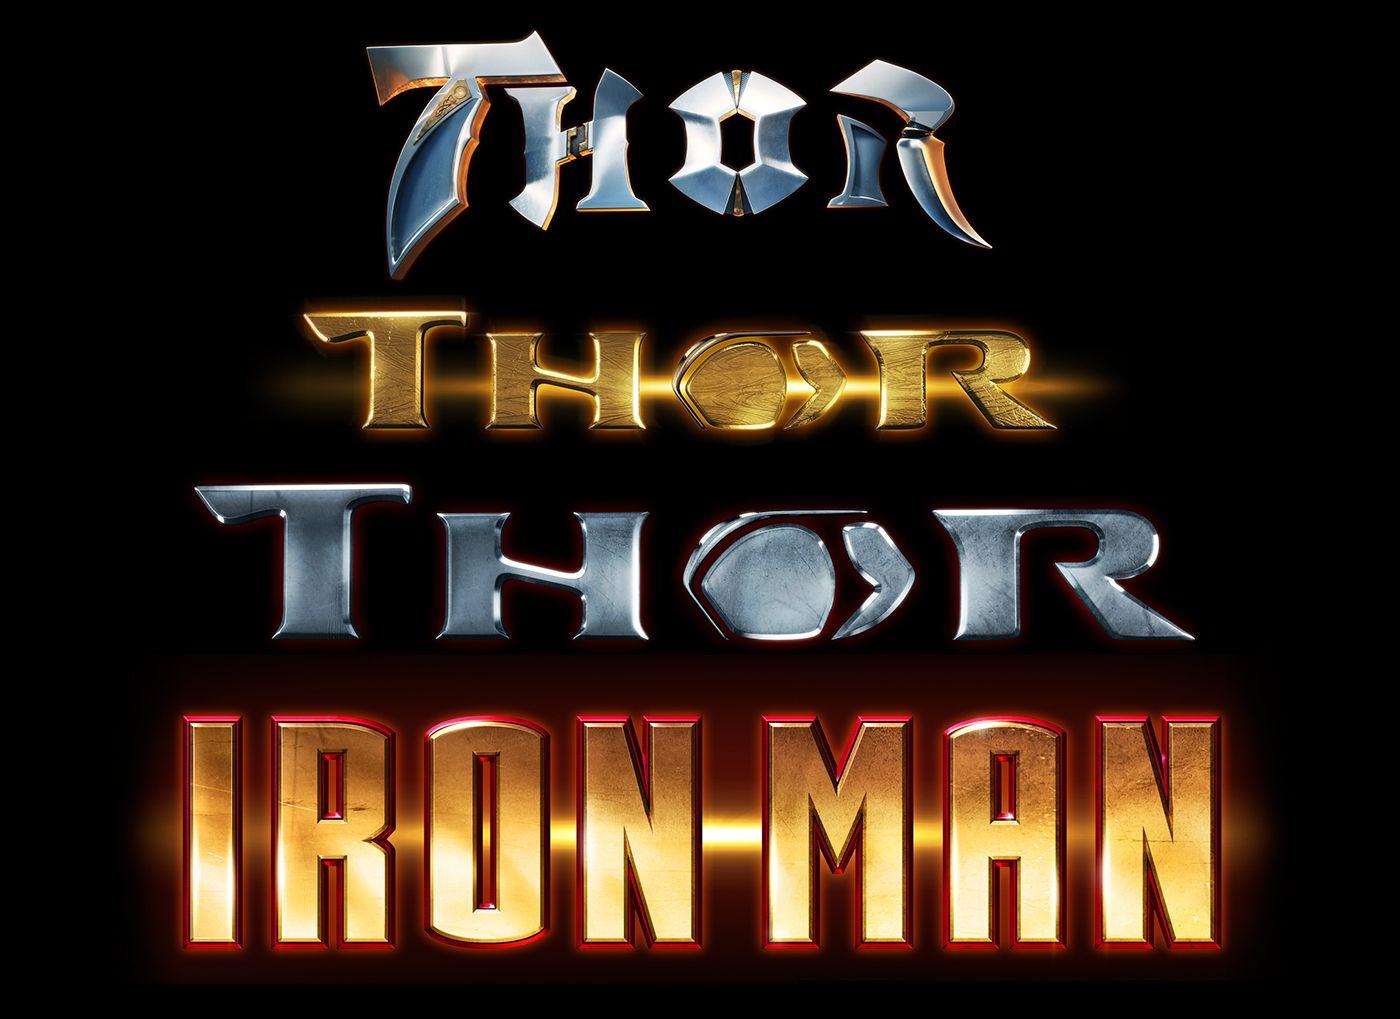 Thor logo The dark world, Thor, Comic book superheroes